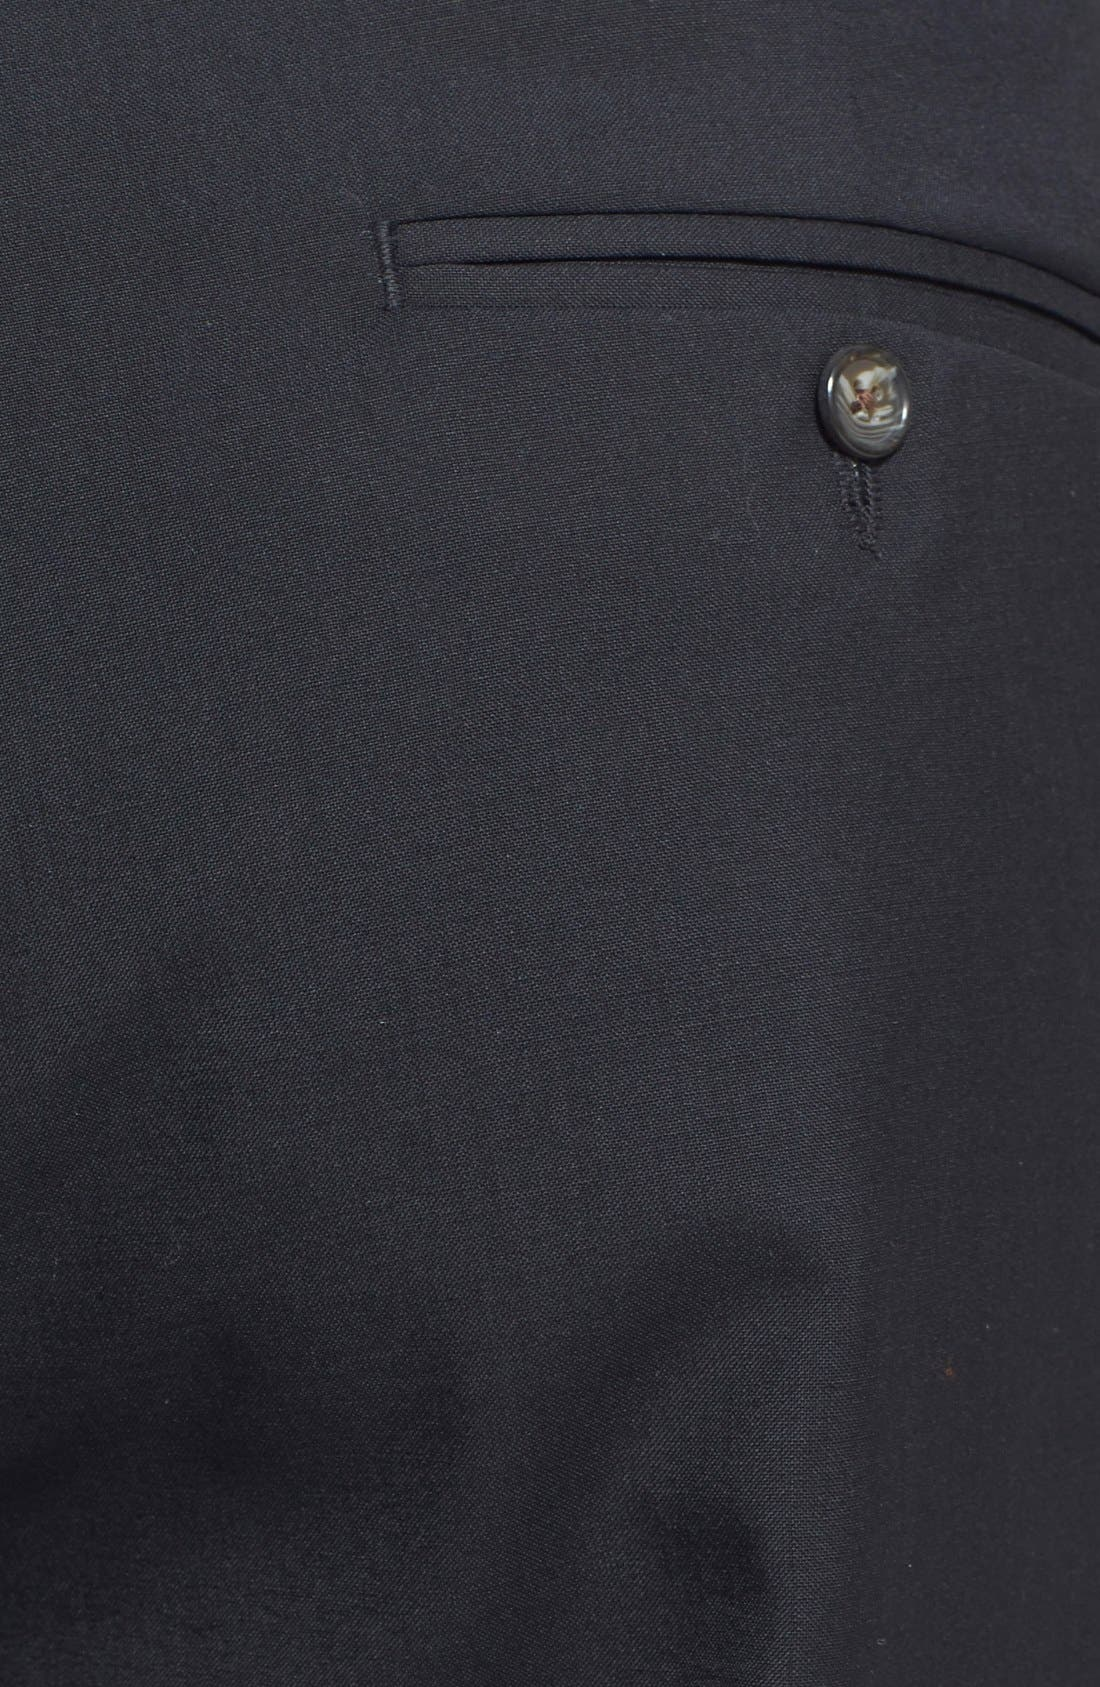 Self Sizer Waist Pleated Trousers,                             Alternate thumbnail 2, color,                             Black